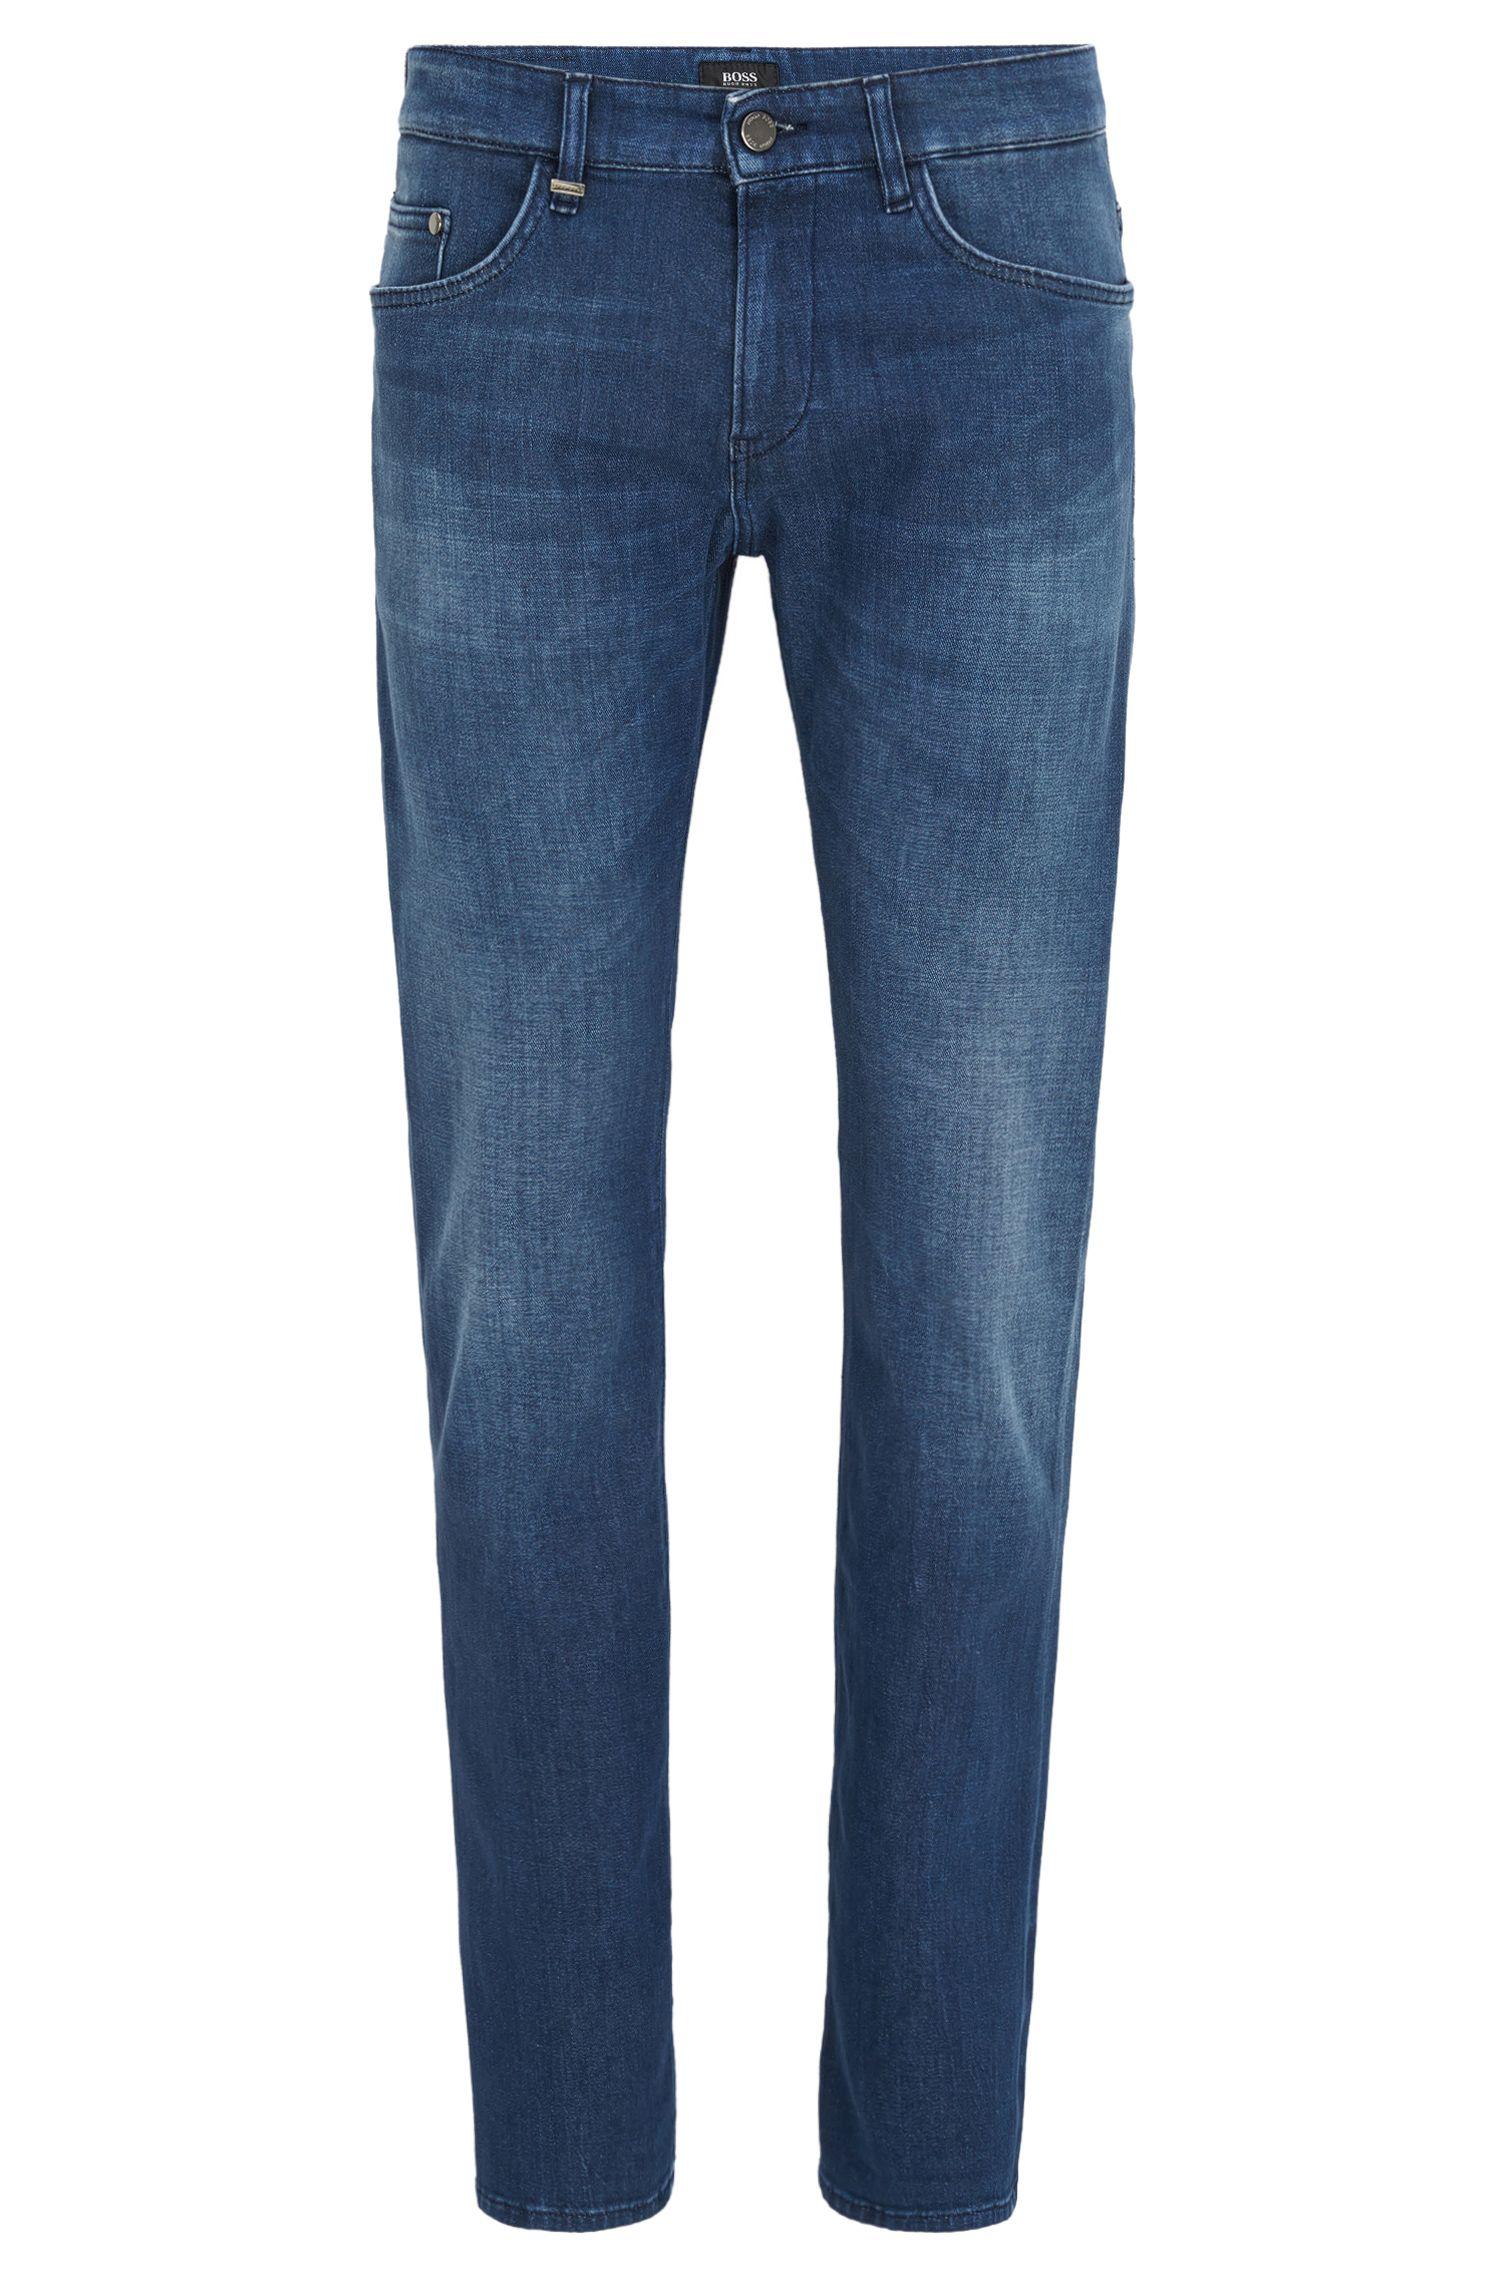 Jeans Slim Fit en denim italien stretch bleu moyen